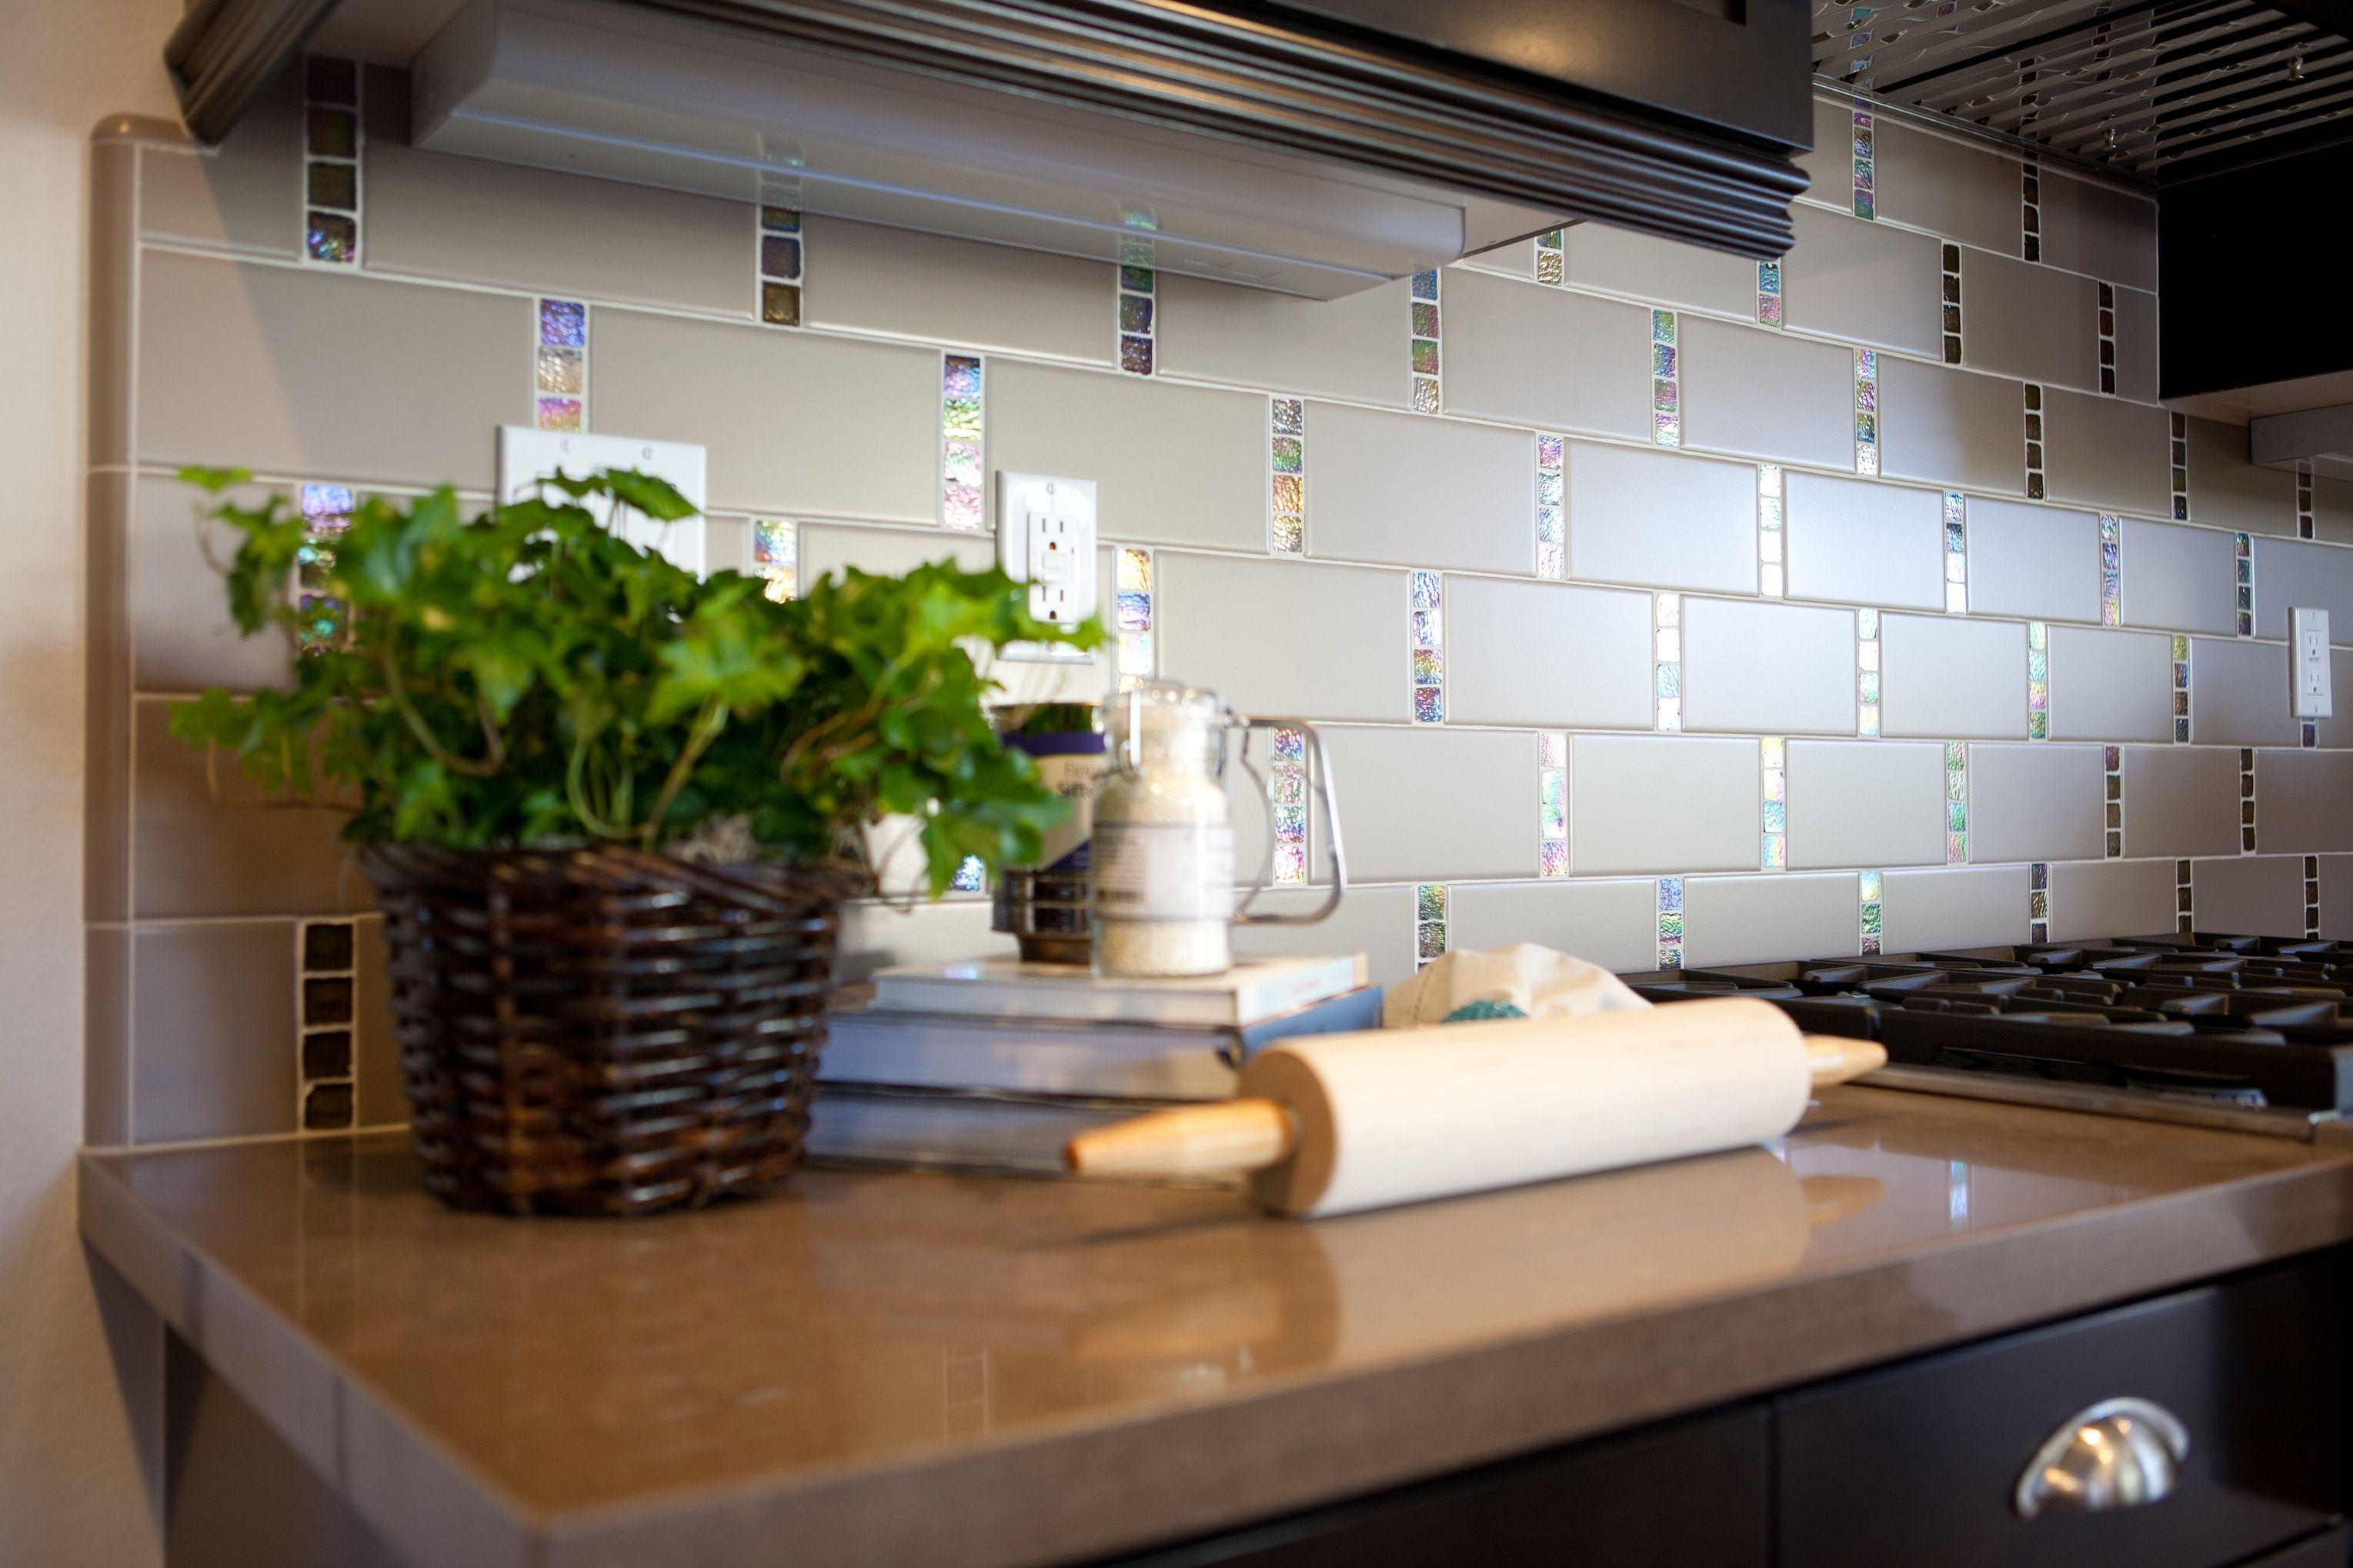 Quarz-küchendesign res  upgraded kitchen slab u tile accents  we showcase an